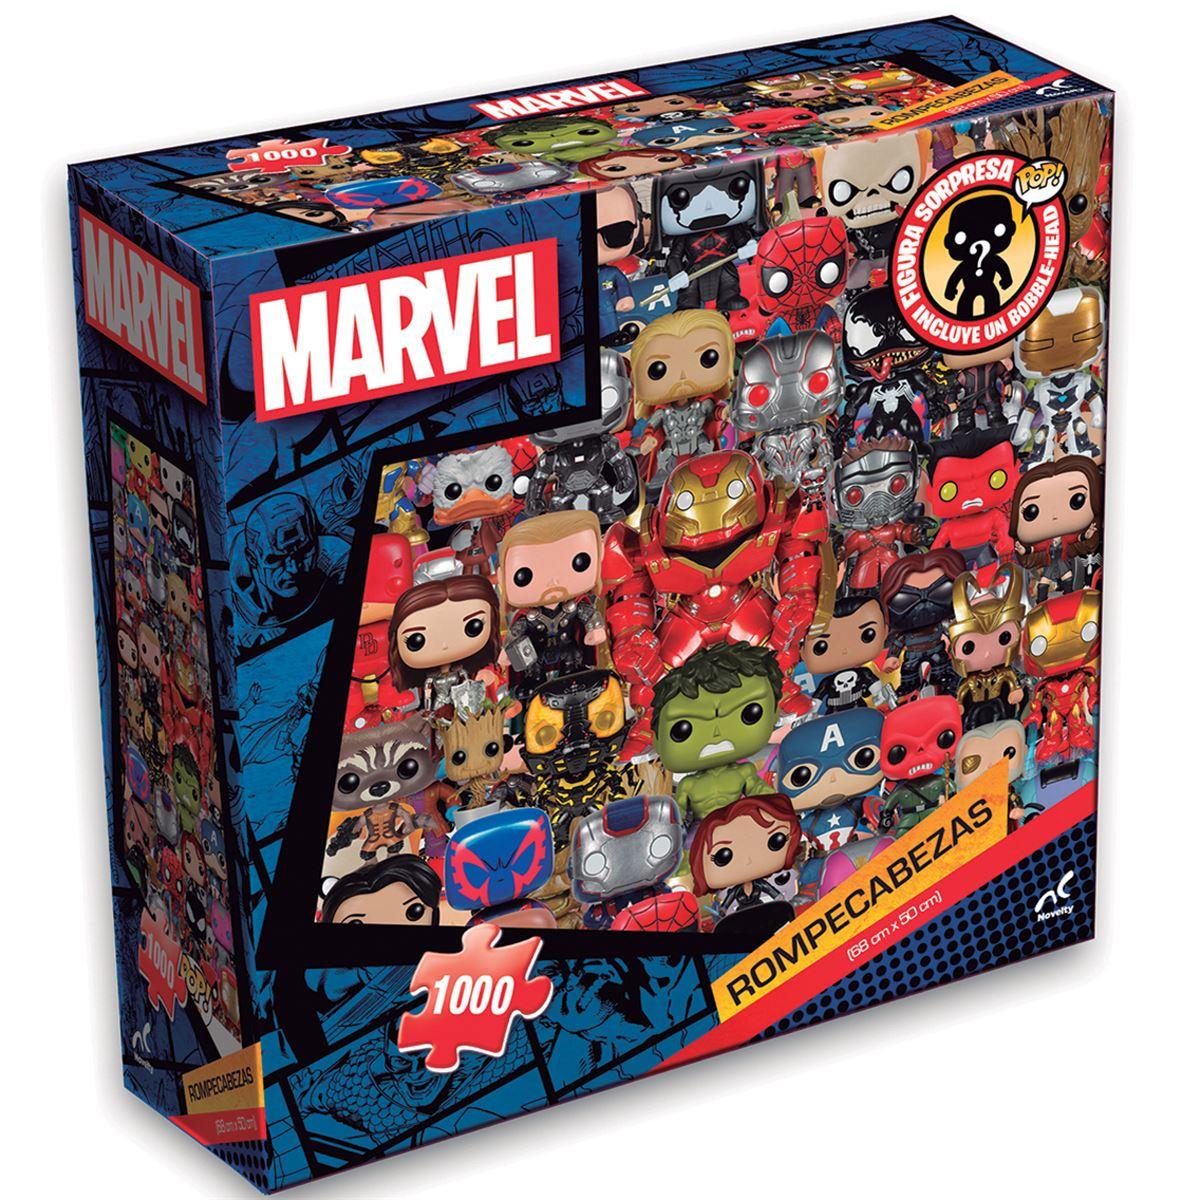 Rompecabezas adulto funko avengers, 1000 piezas, caja cartón - Sanborns